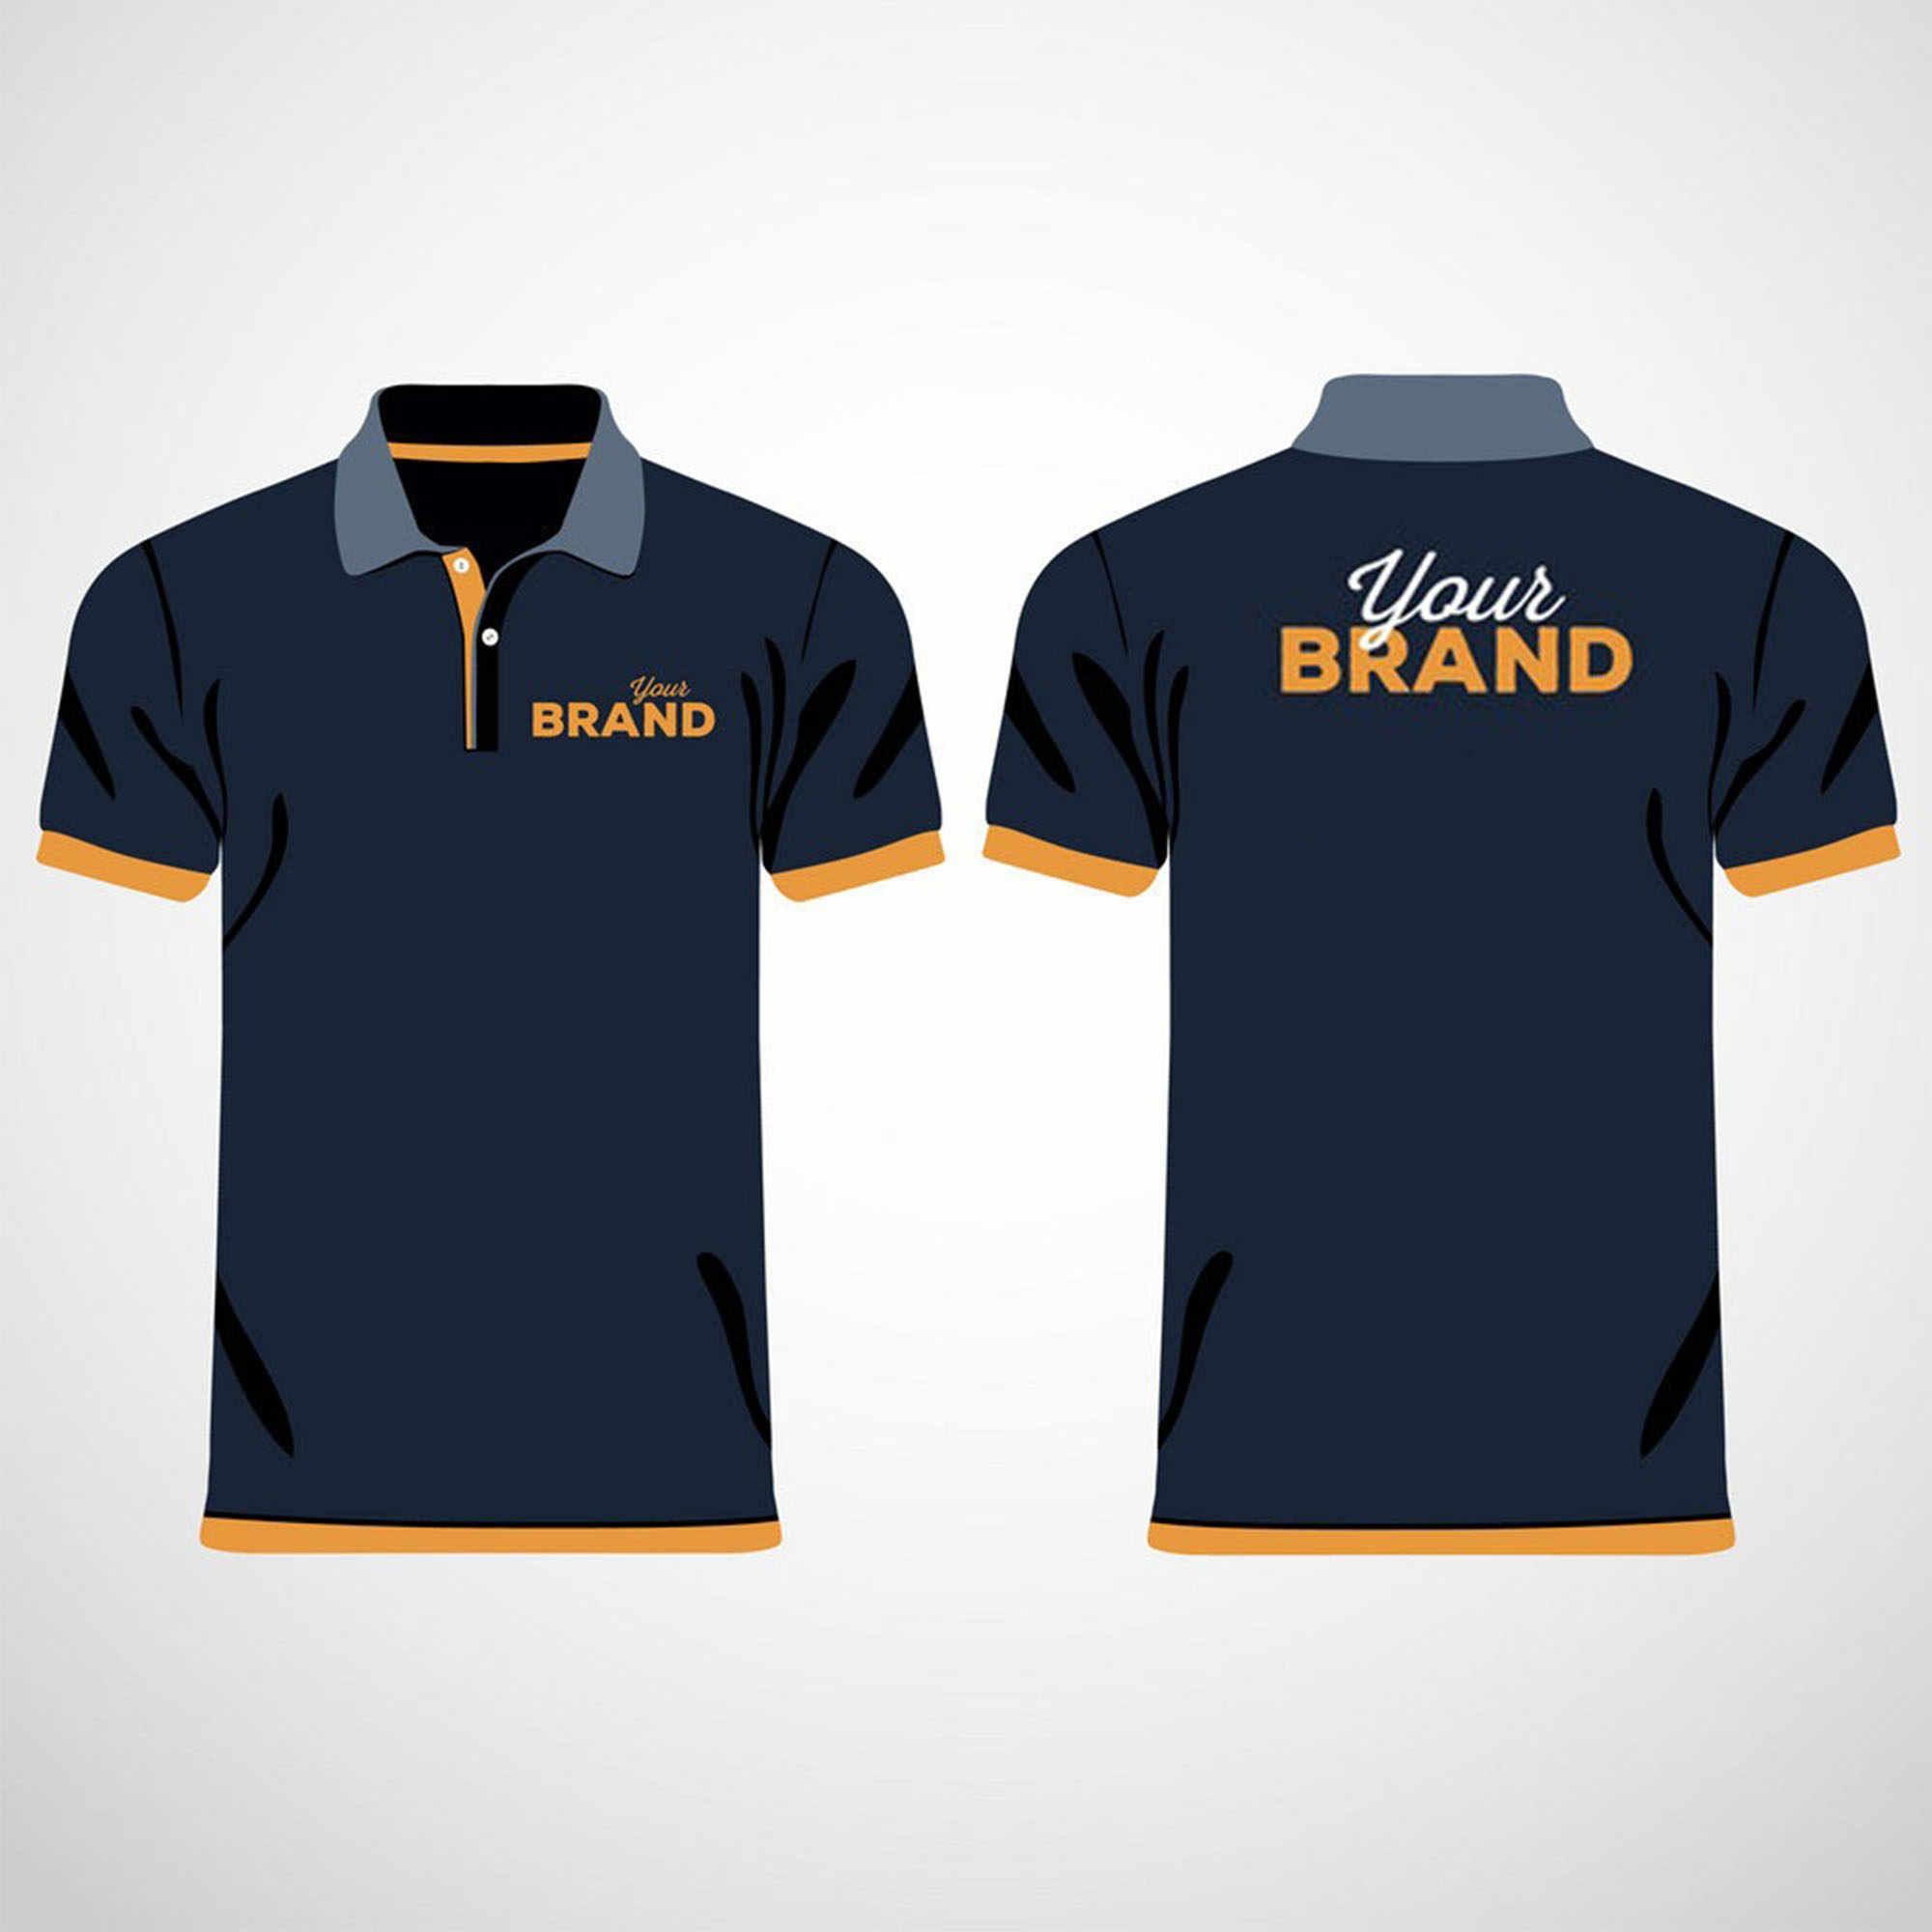 Download Source Custom Color 100 Cotton Plain Sport Polo T Shirt For Men Royal Blue Polo Shirts Gol Vestuario De Trabalho Fardas Profissionais Camisetas Masculinas